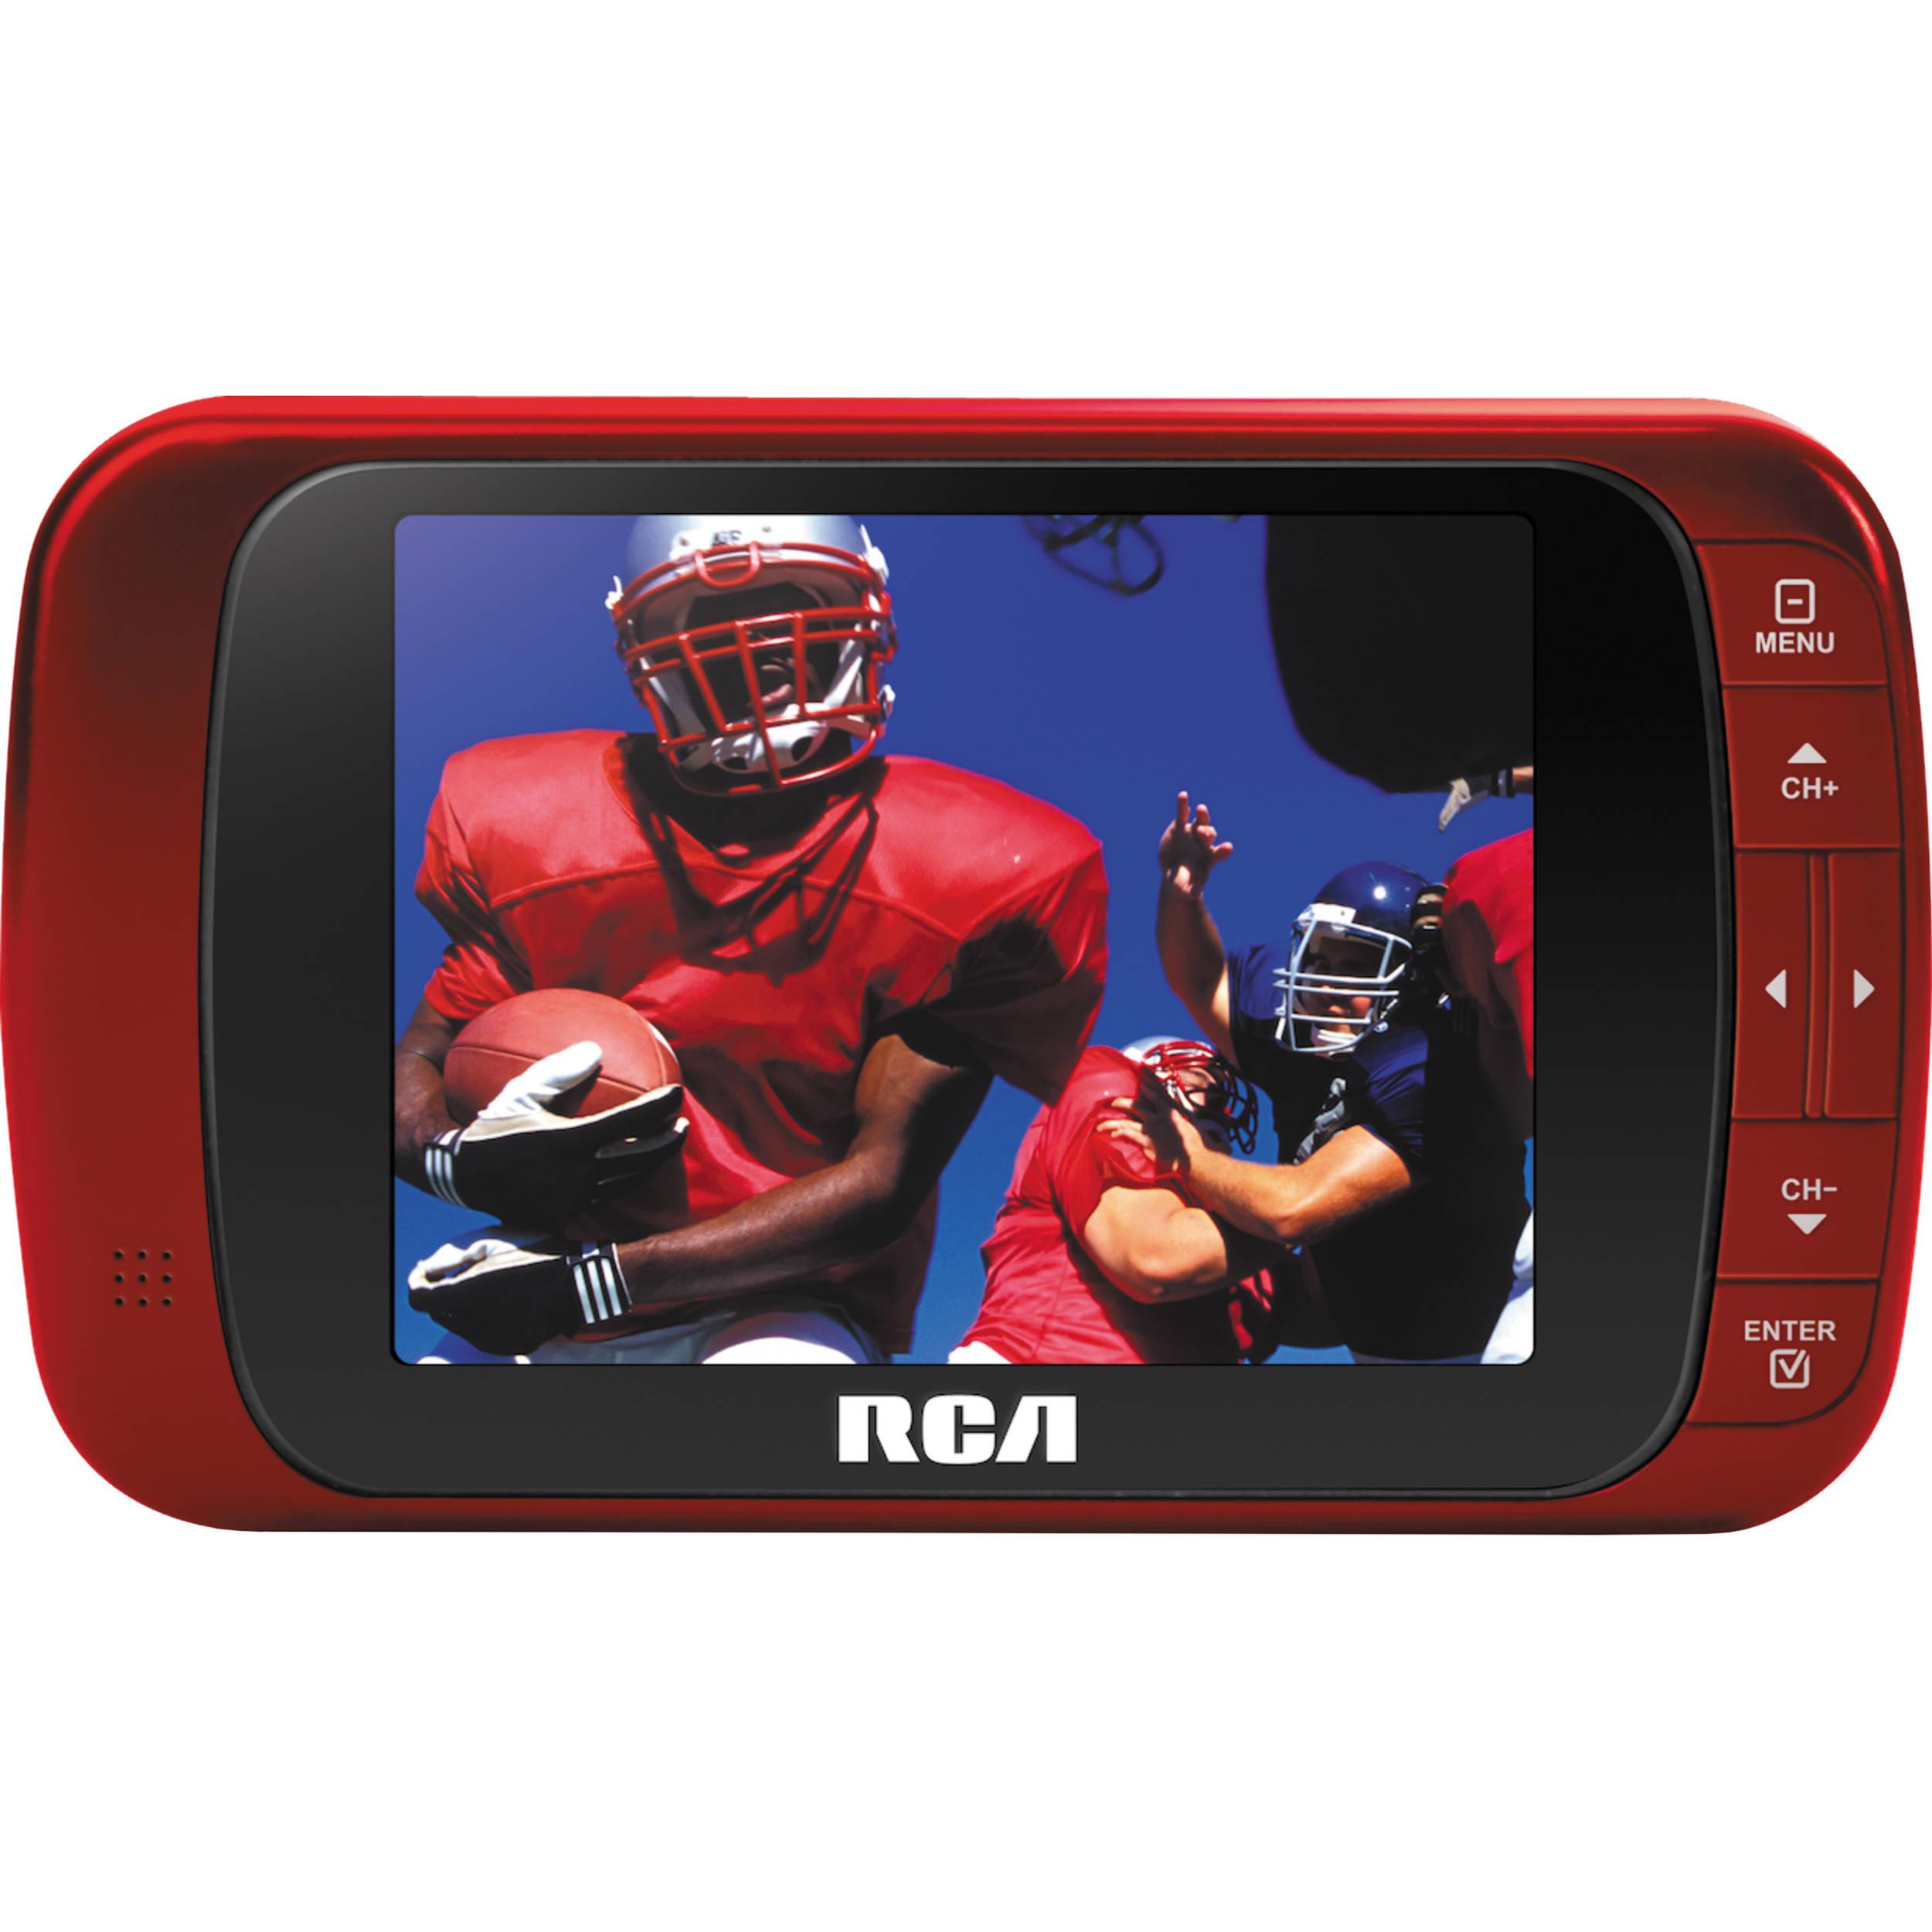 "Best Portable Tv For Hurricane Portable Greenhouse Cold Frame Portable Dishwasher Saskatoon Portable Steel Straw: RCA 3.5"" LED Portable Digital TV (Red) DHT235AR B&H Photo"